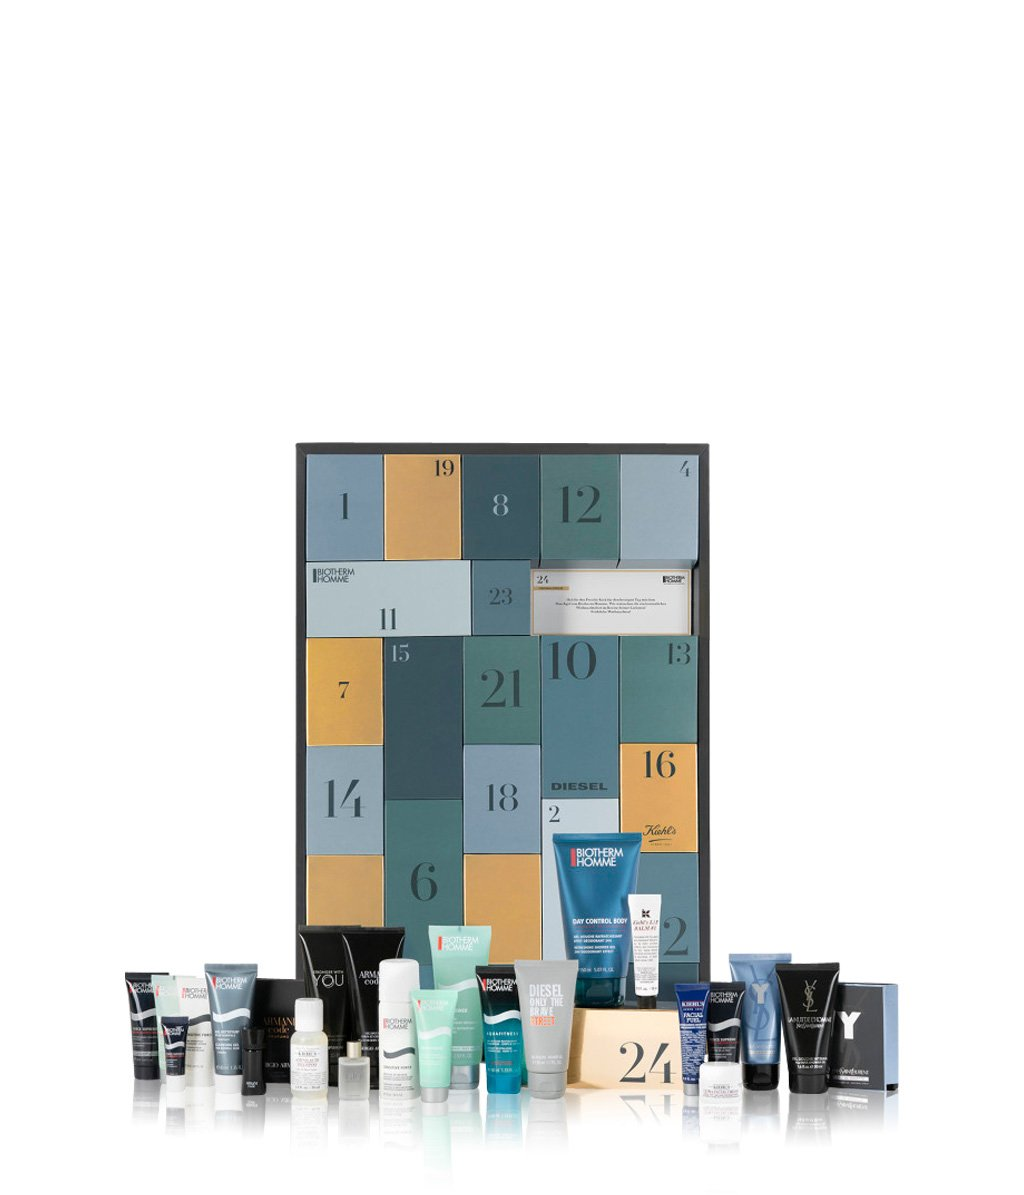 L'Oréal Homme Luxus Adventskalender - Bild 3